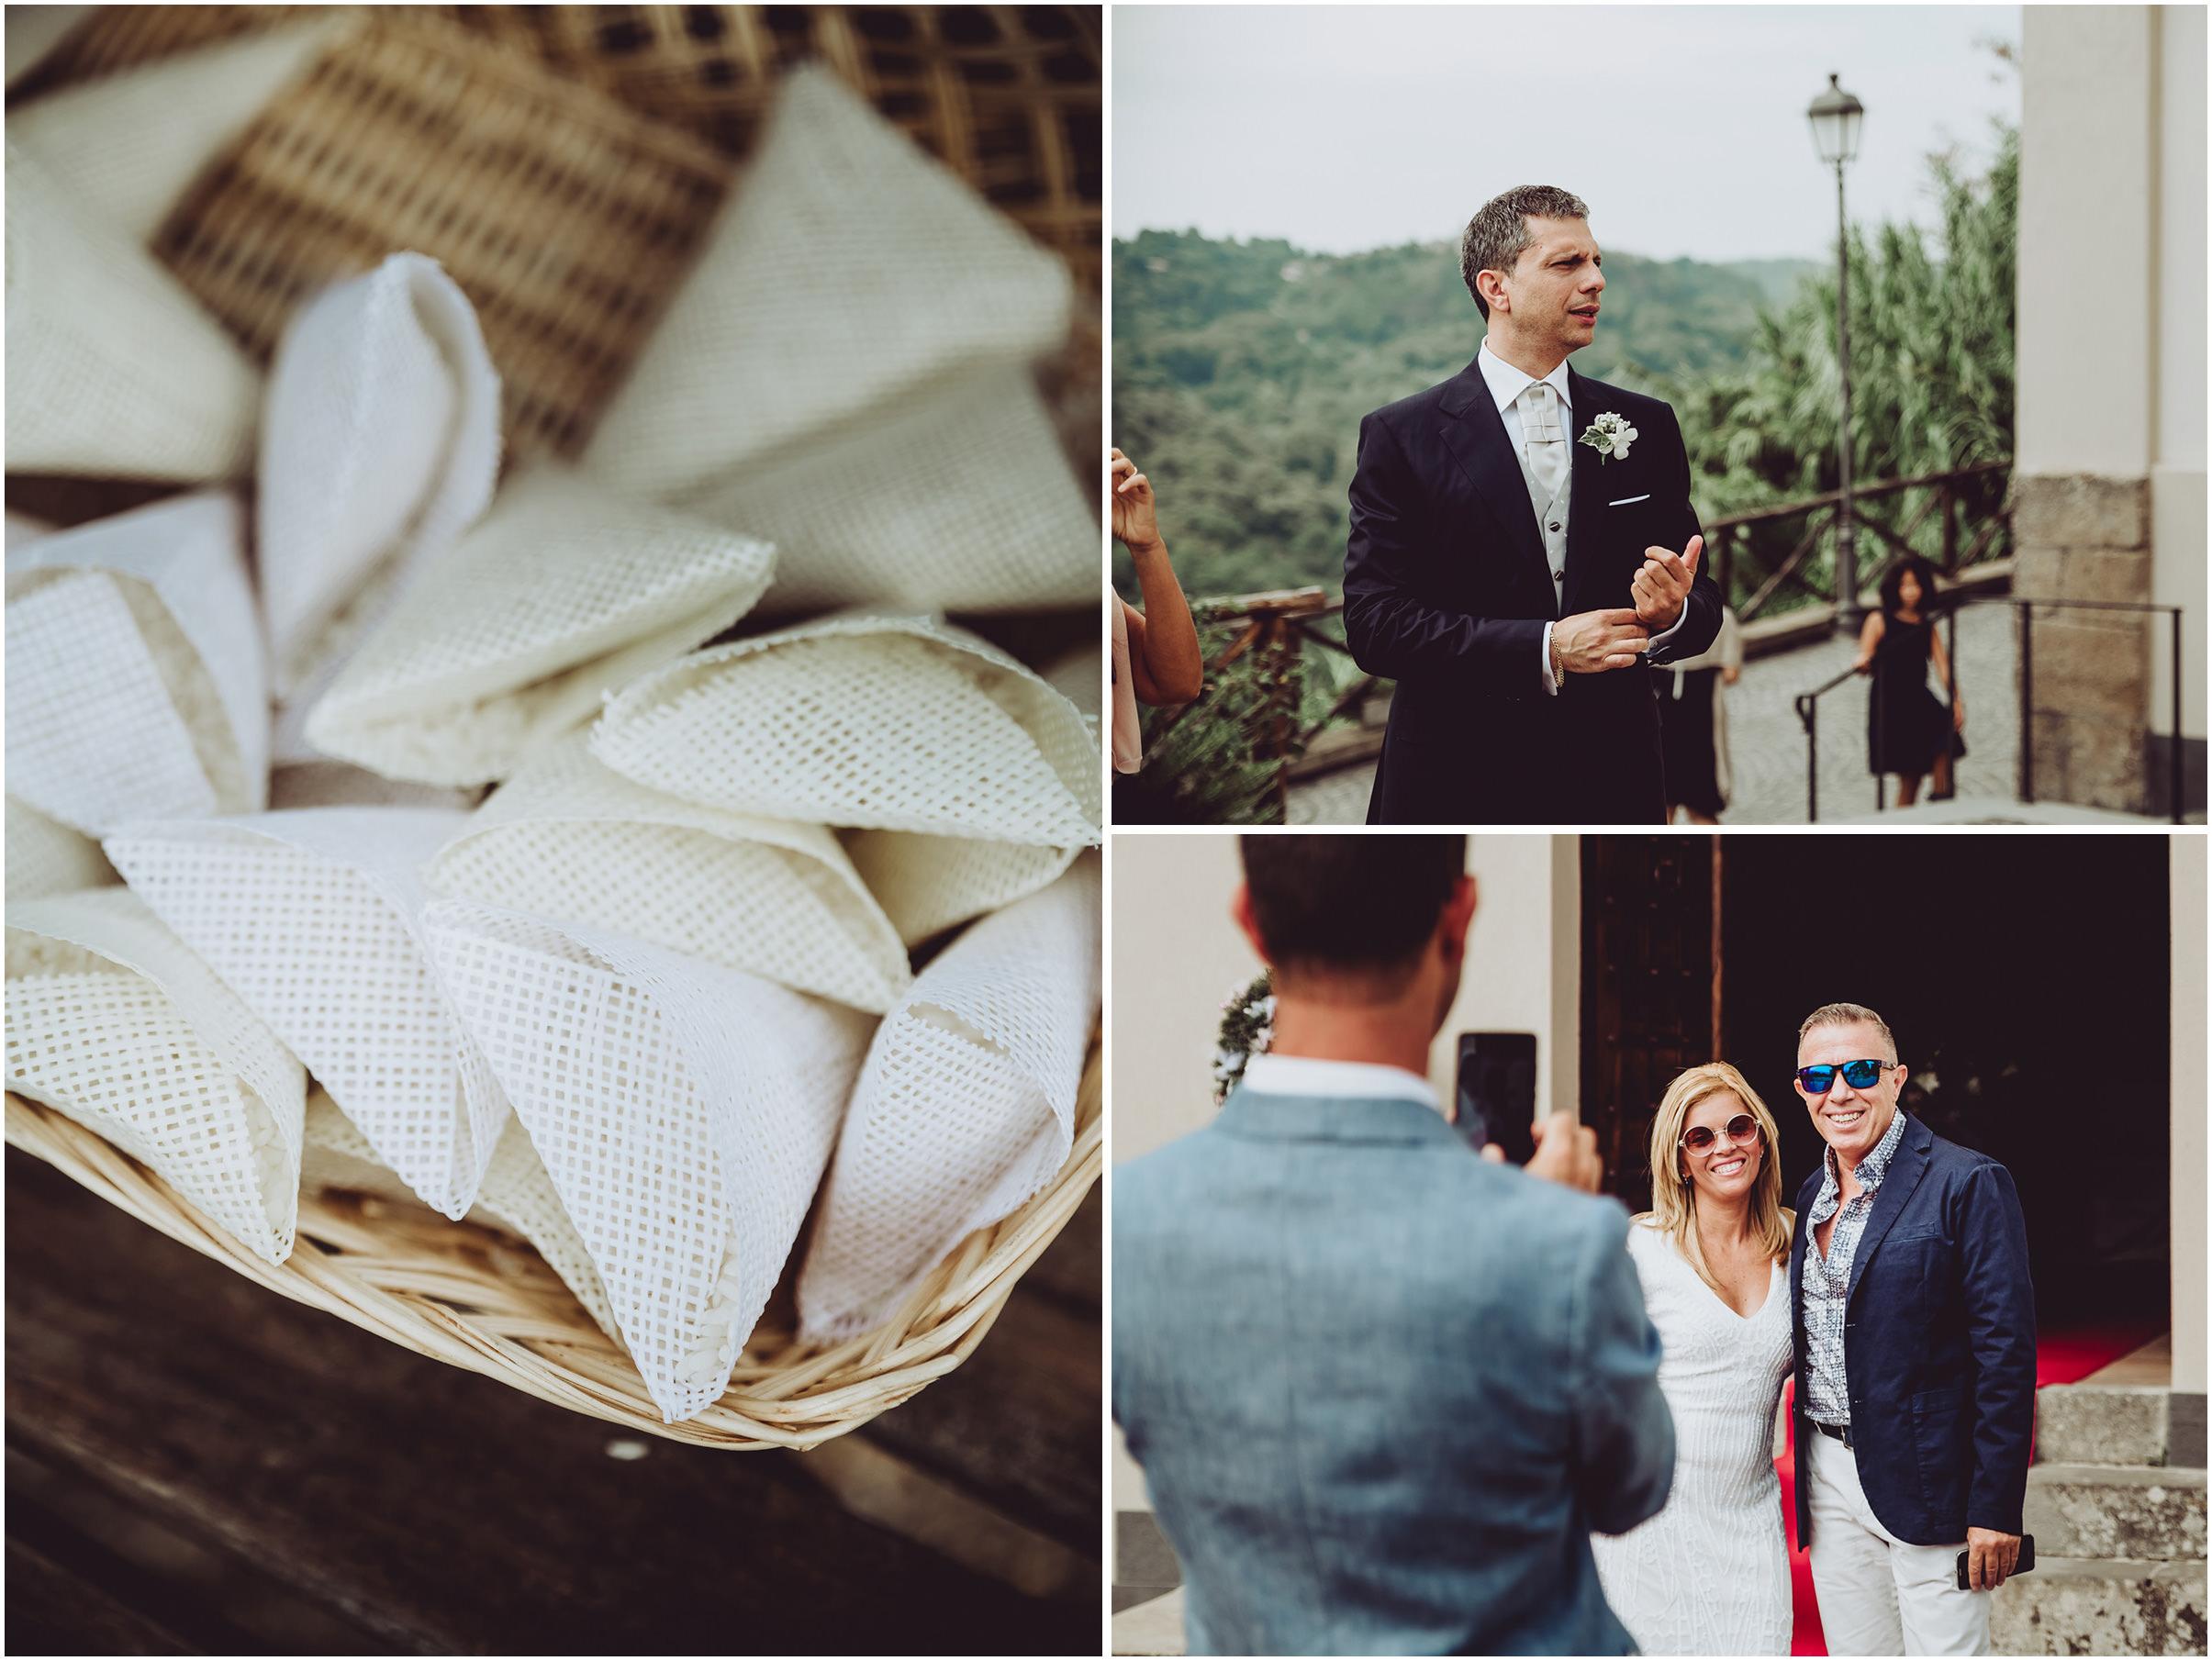 WEDDING-PHOTOGRAPHY-SARA-LORENZONI-FOTOGRAFIA-MATRIMONIO-ORVIETO-JUKA-ANTONELLO04